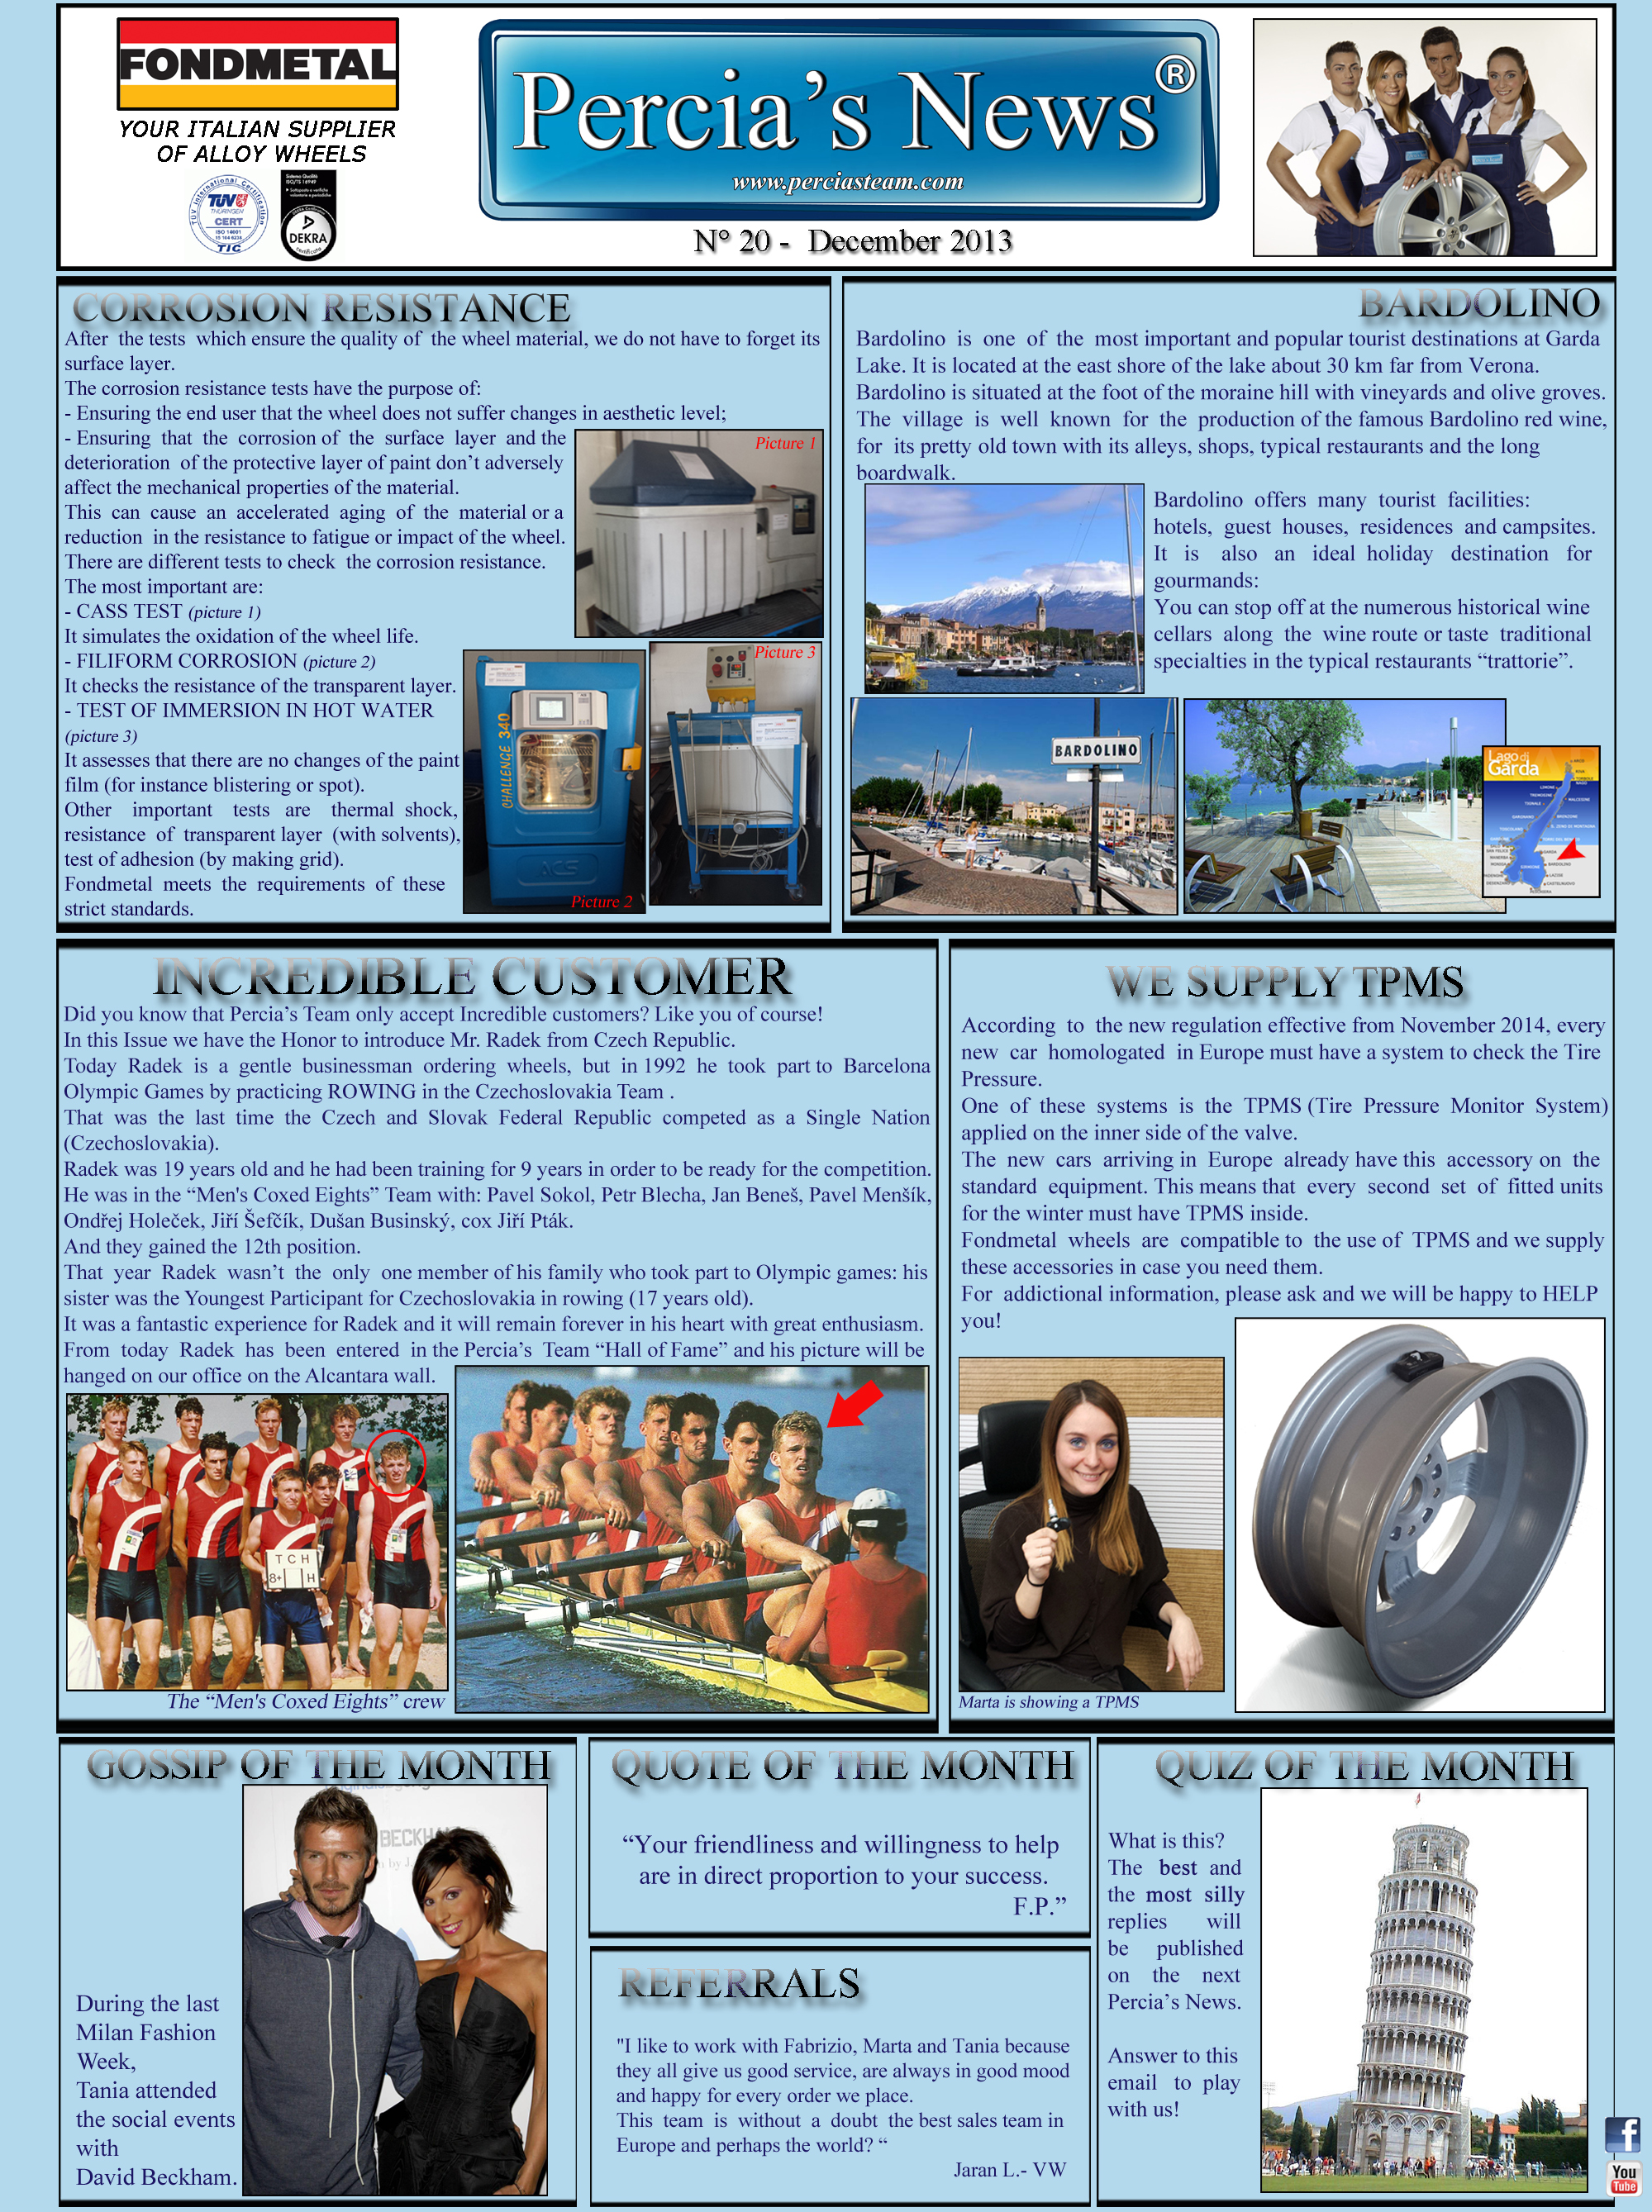 PERCIA'S NEWS -DECEMBER 2013